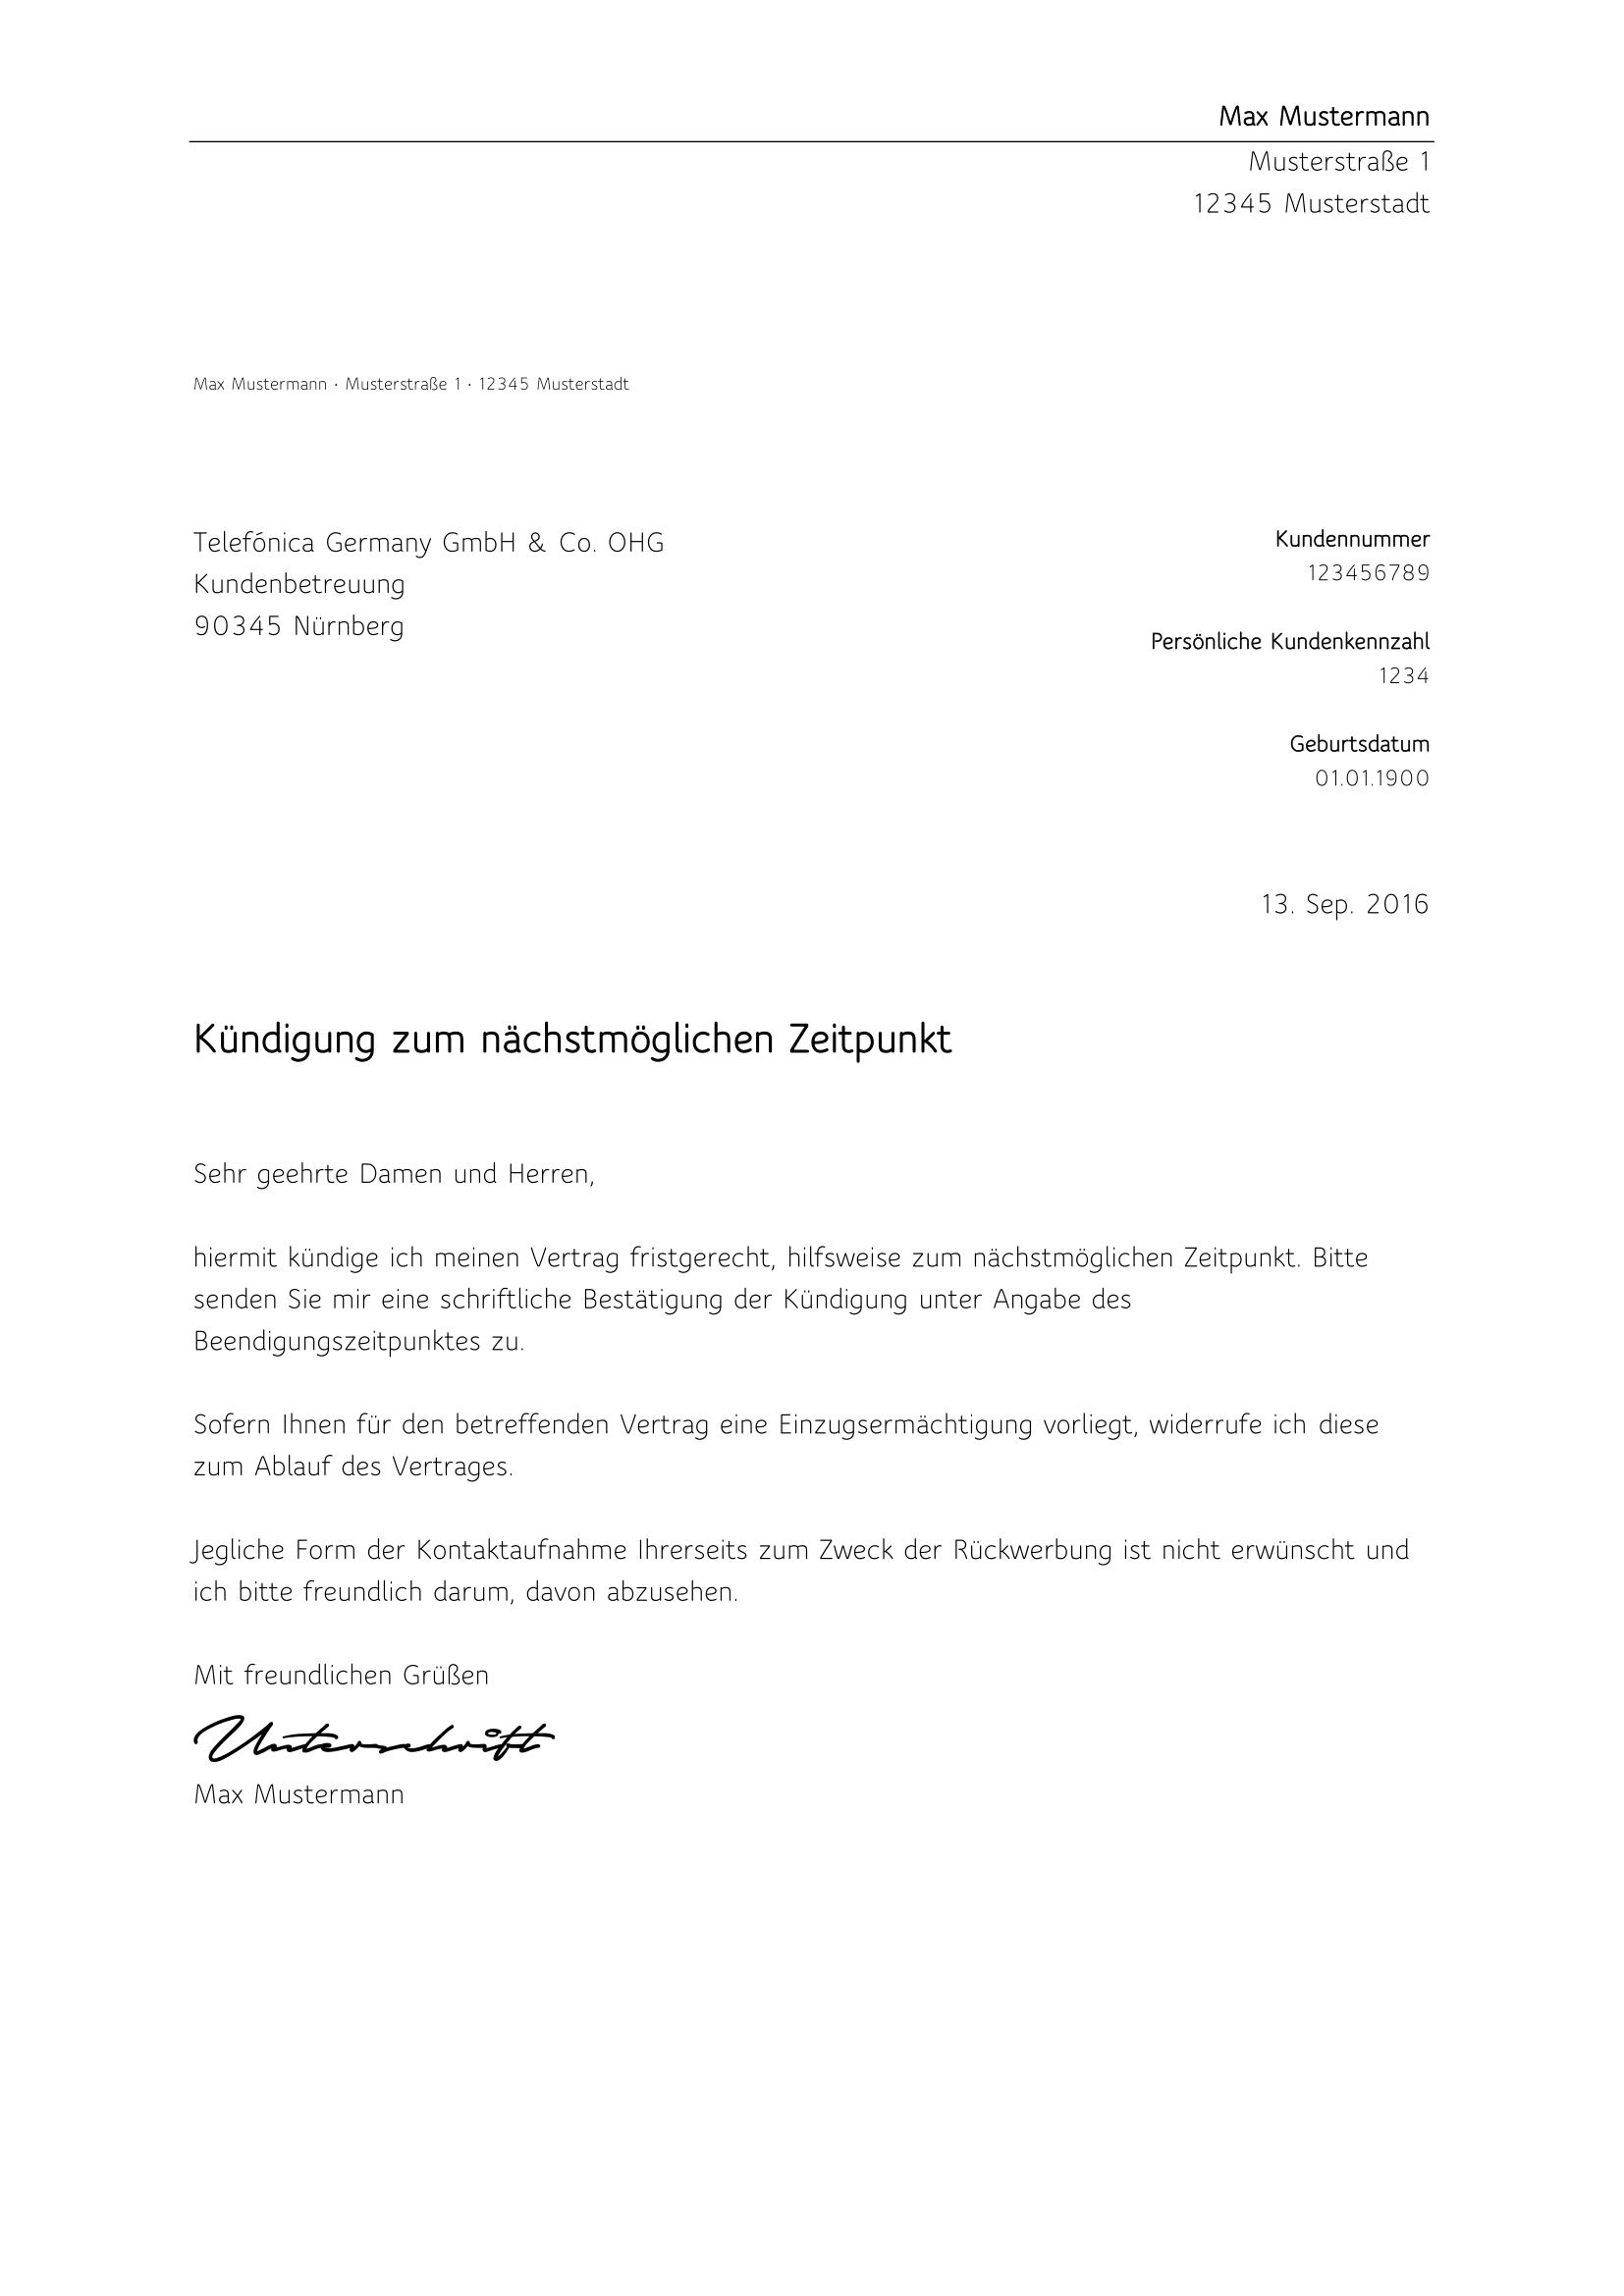 Meeega Schlechter Service O₂ Community